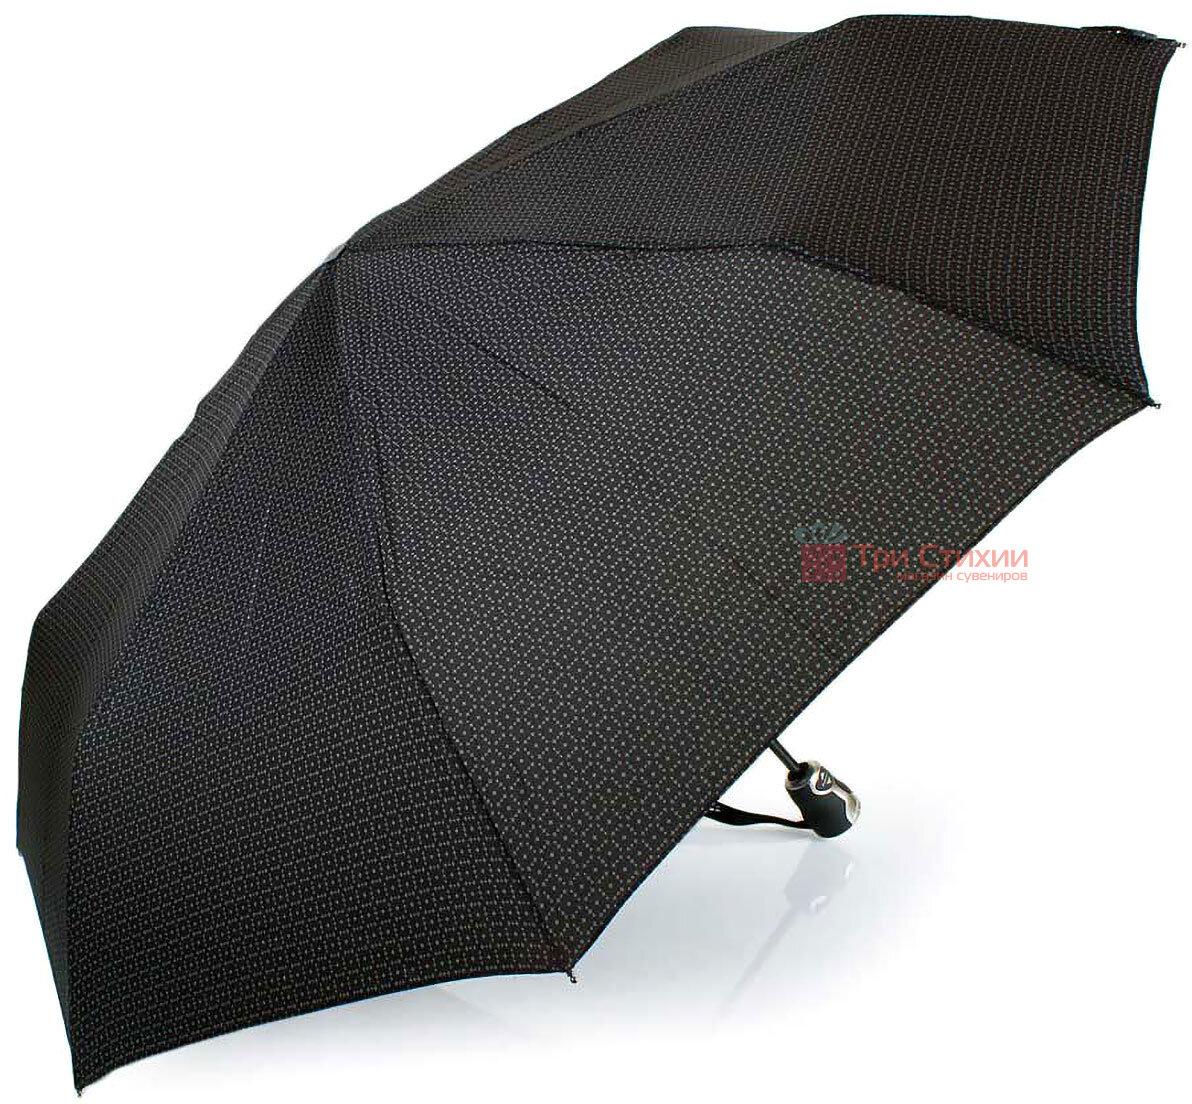 Зонт складной Bugatti 74667BU полный автомат Серый, фото